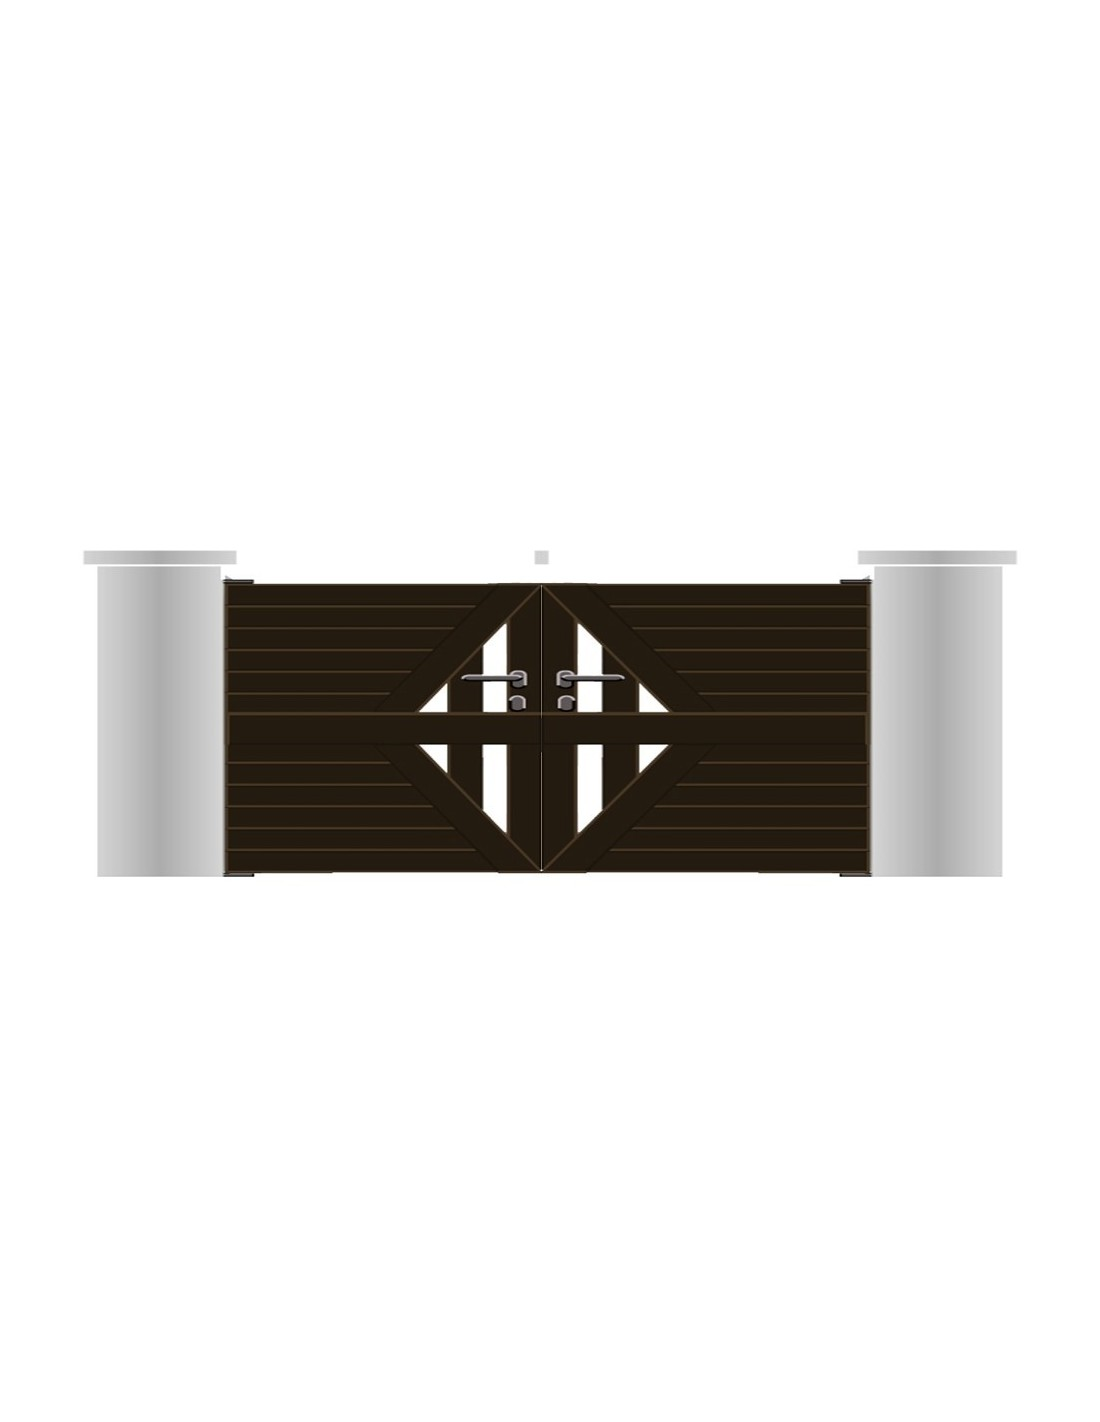 Portail aluminium vannes design contemporain sur mesure for Portail 4m50